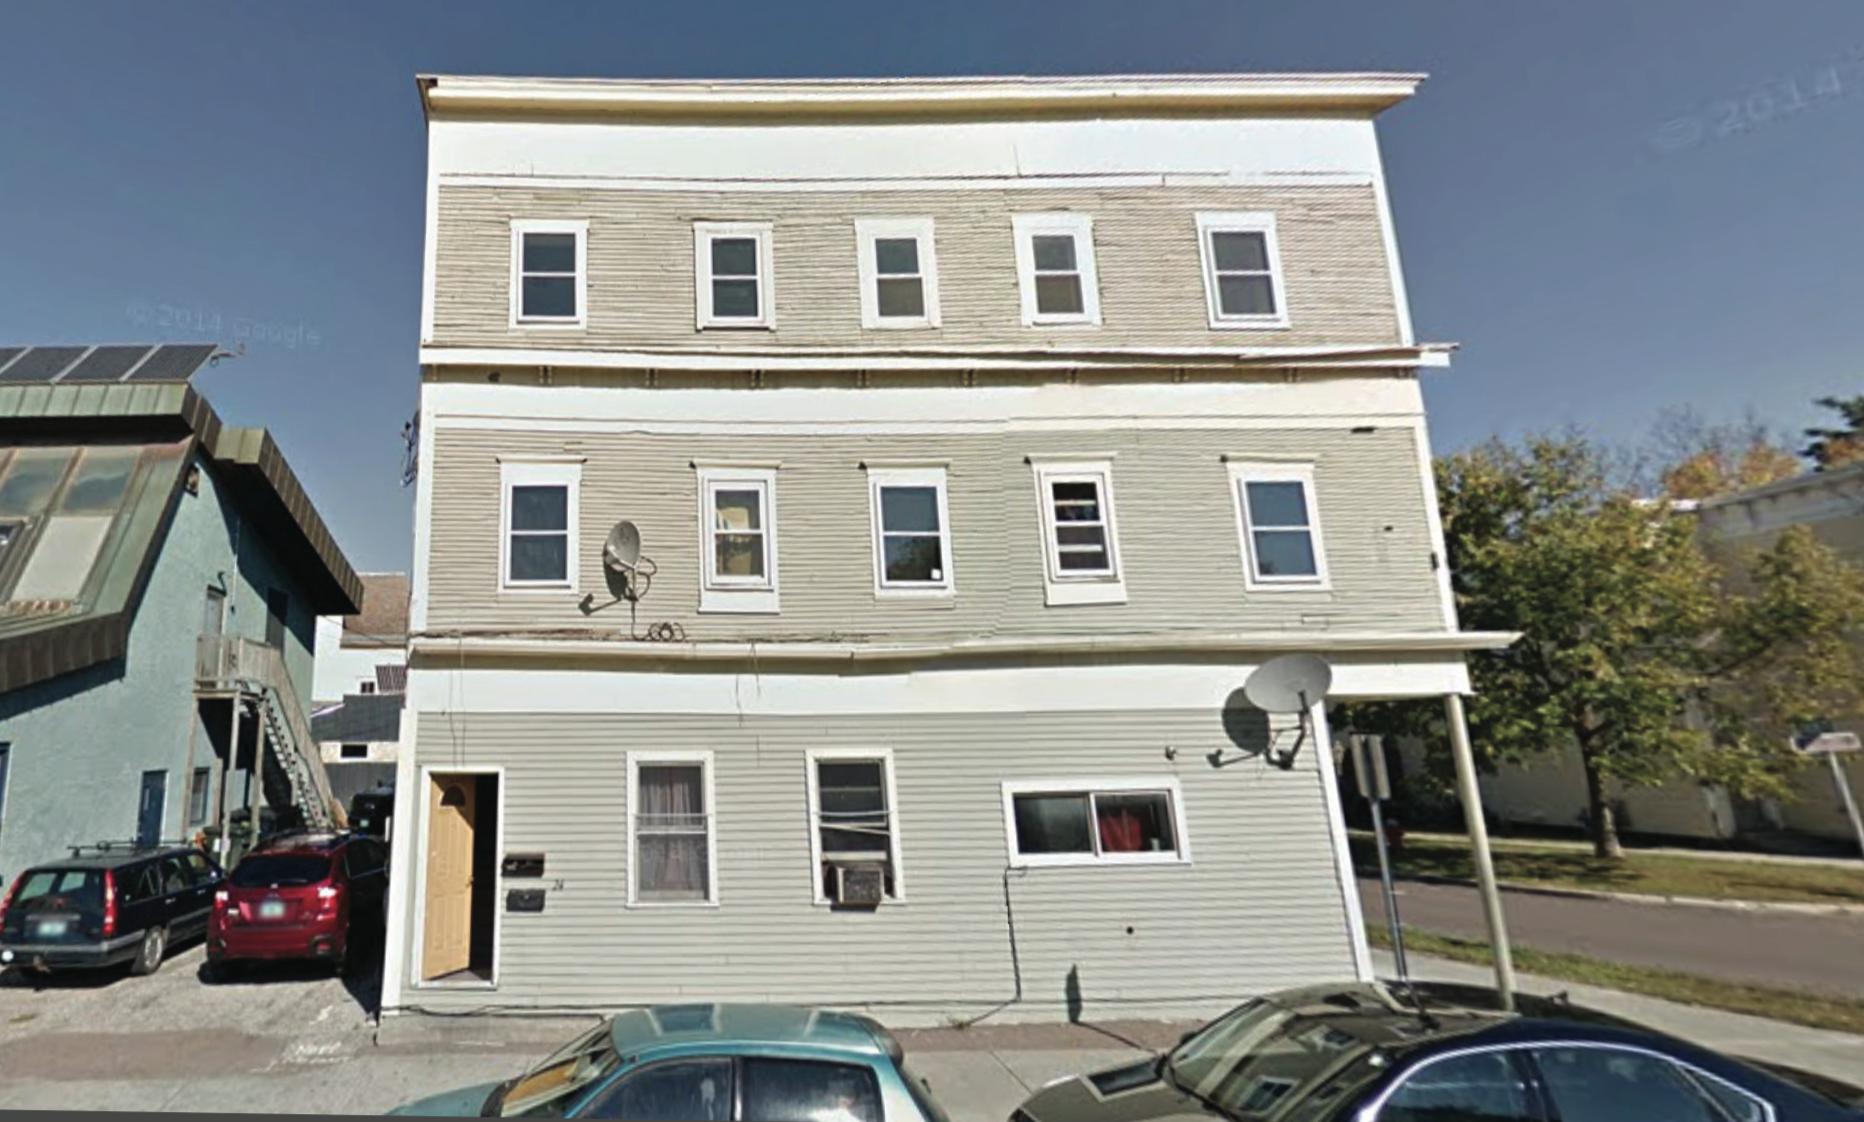 24-28 North Street